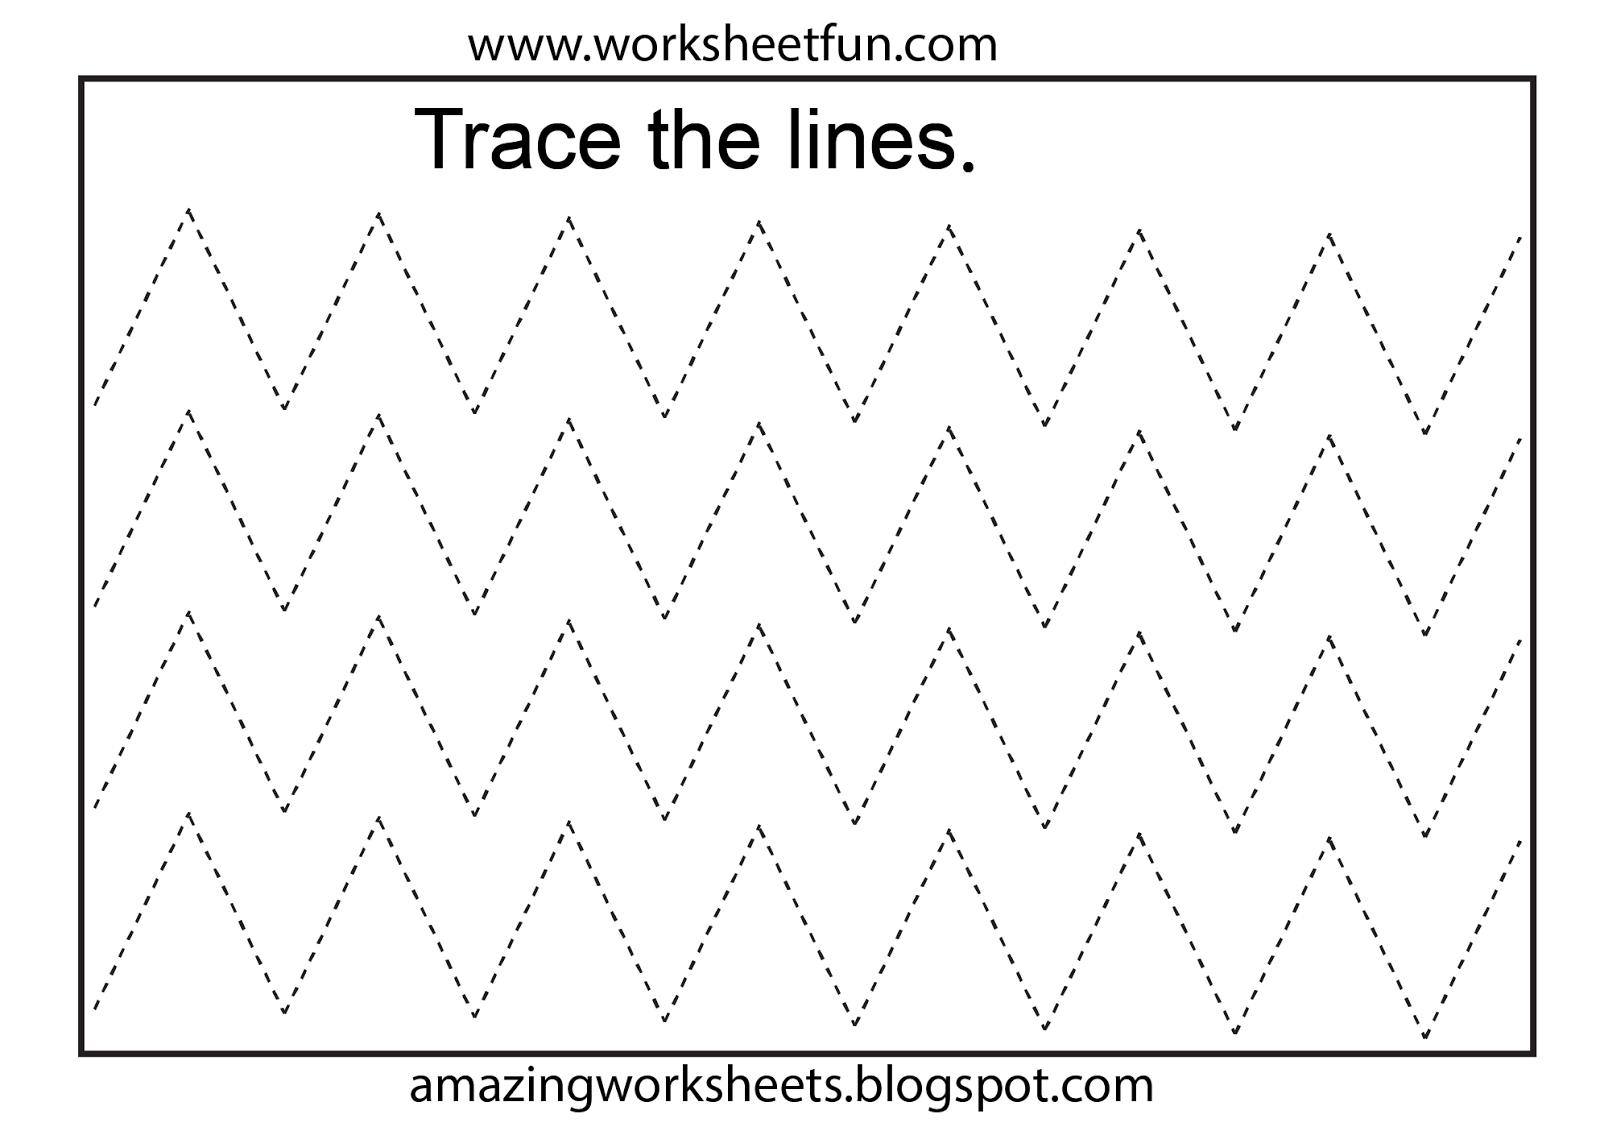 Free Printable Tracing Worksheets For Preschoolers